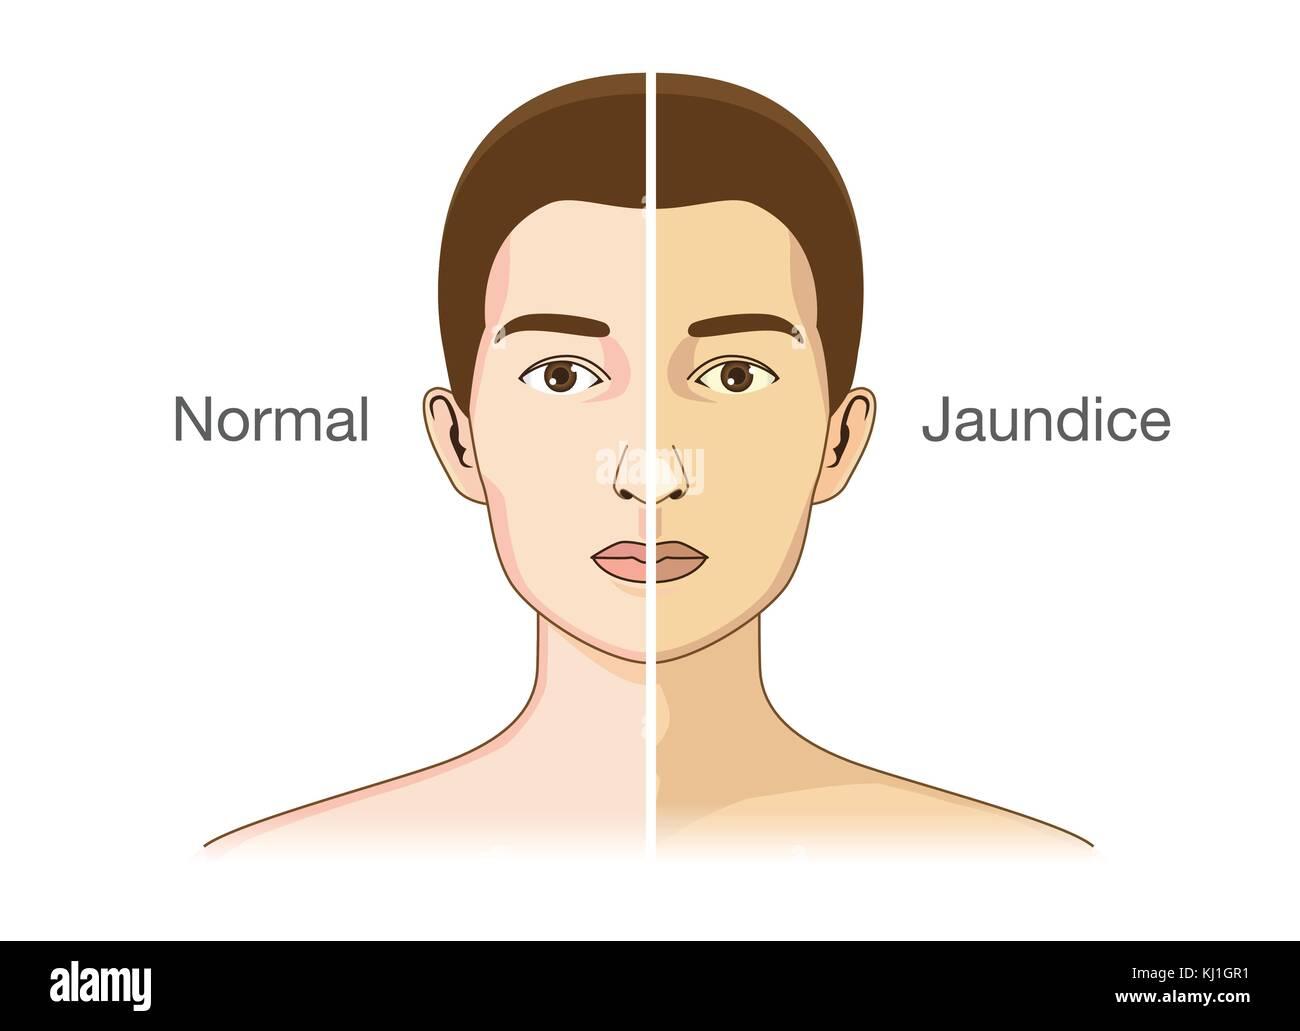 The Comparison between normal skin people - Stock Vector